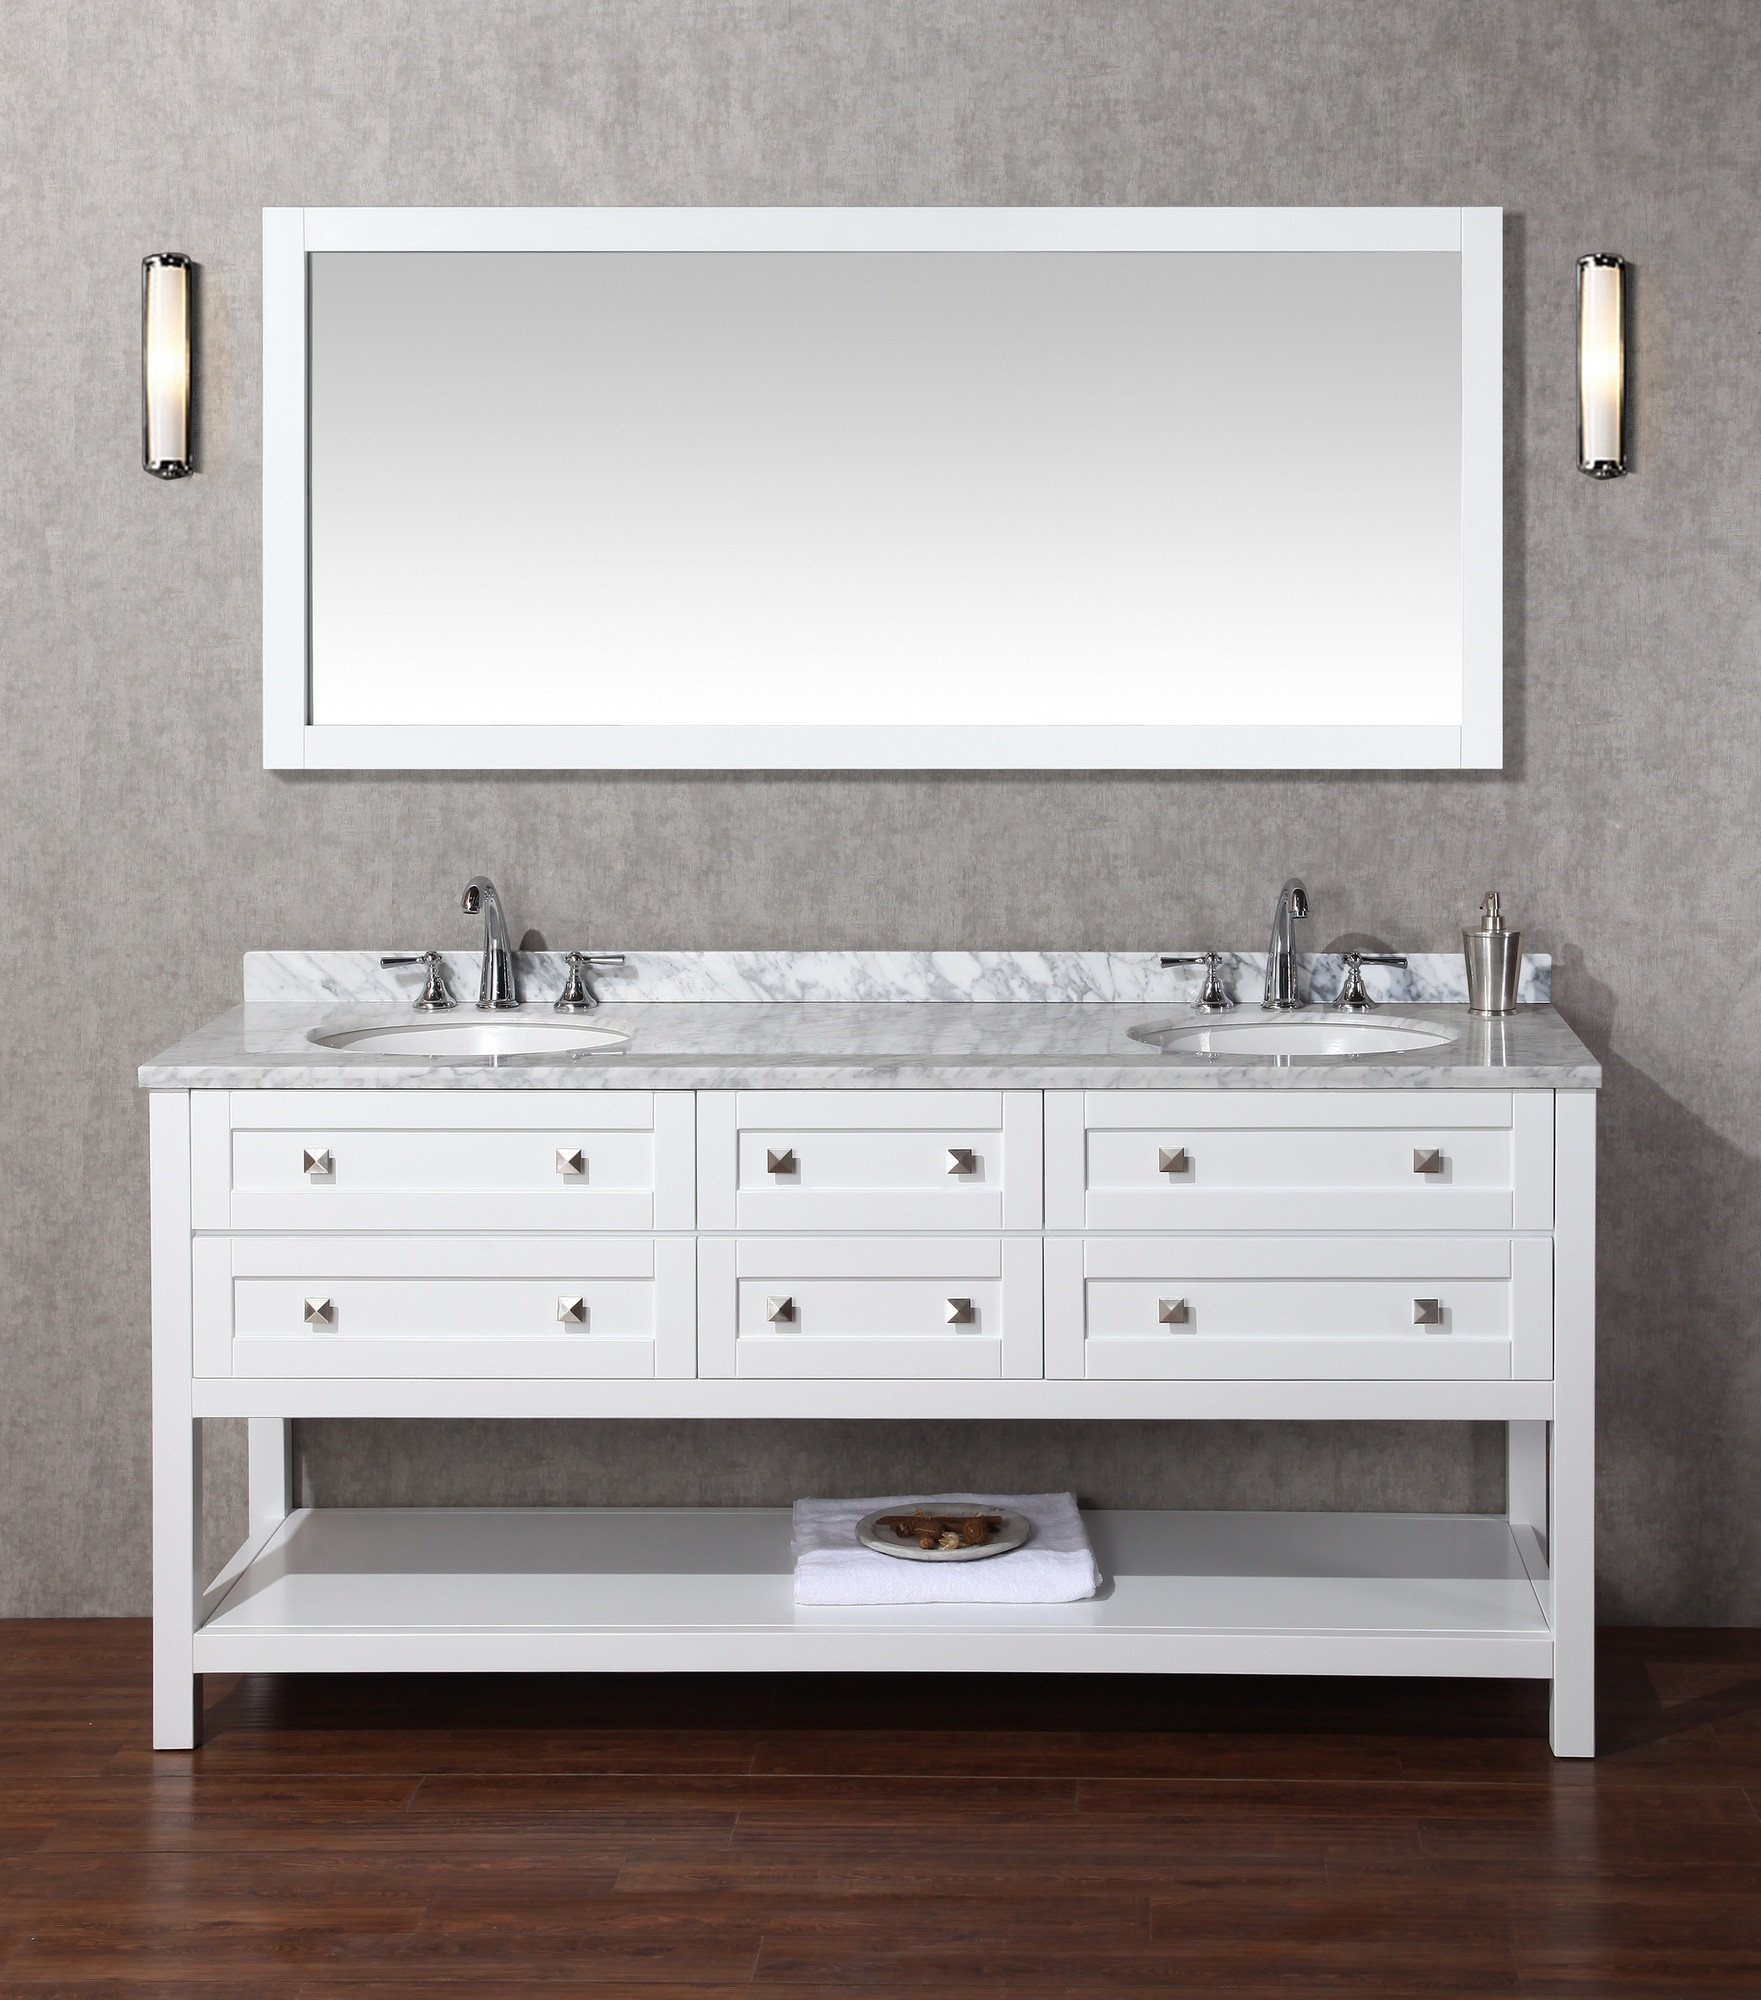 Stufurhome HD-6868W-72-CR Marla Double Sink Bathroom Vanity with Mirror